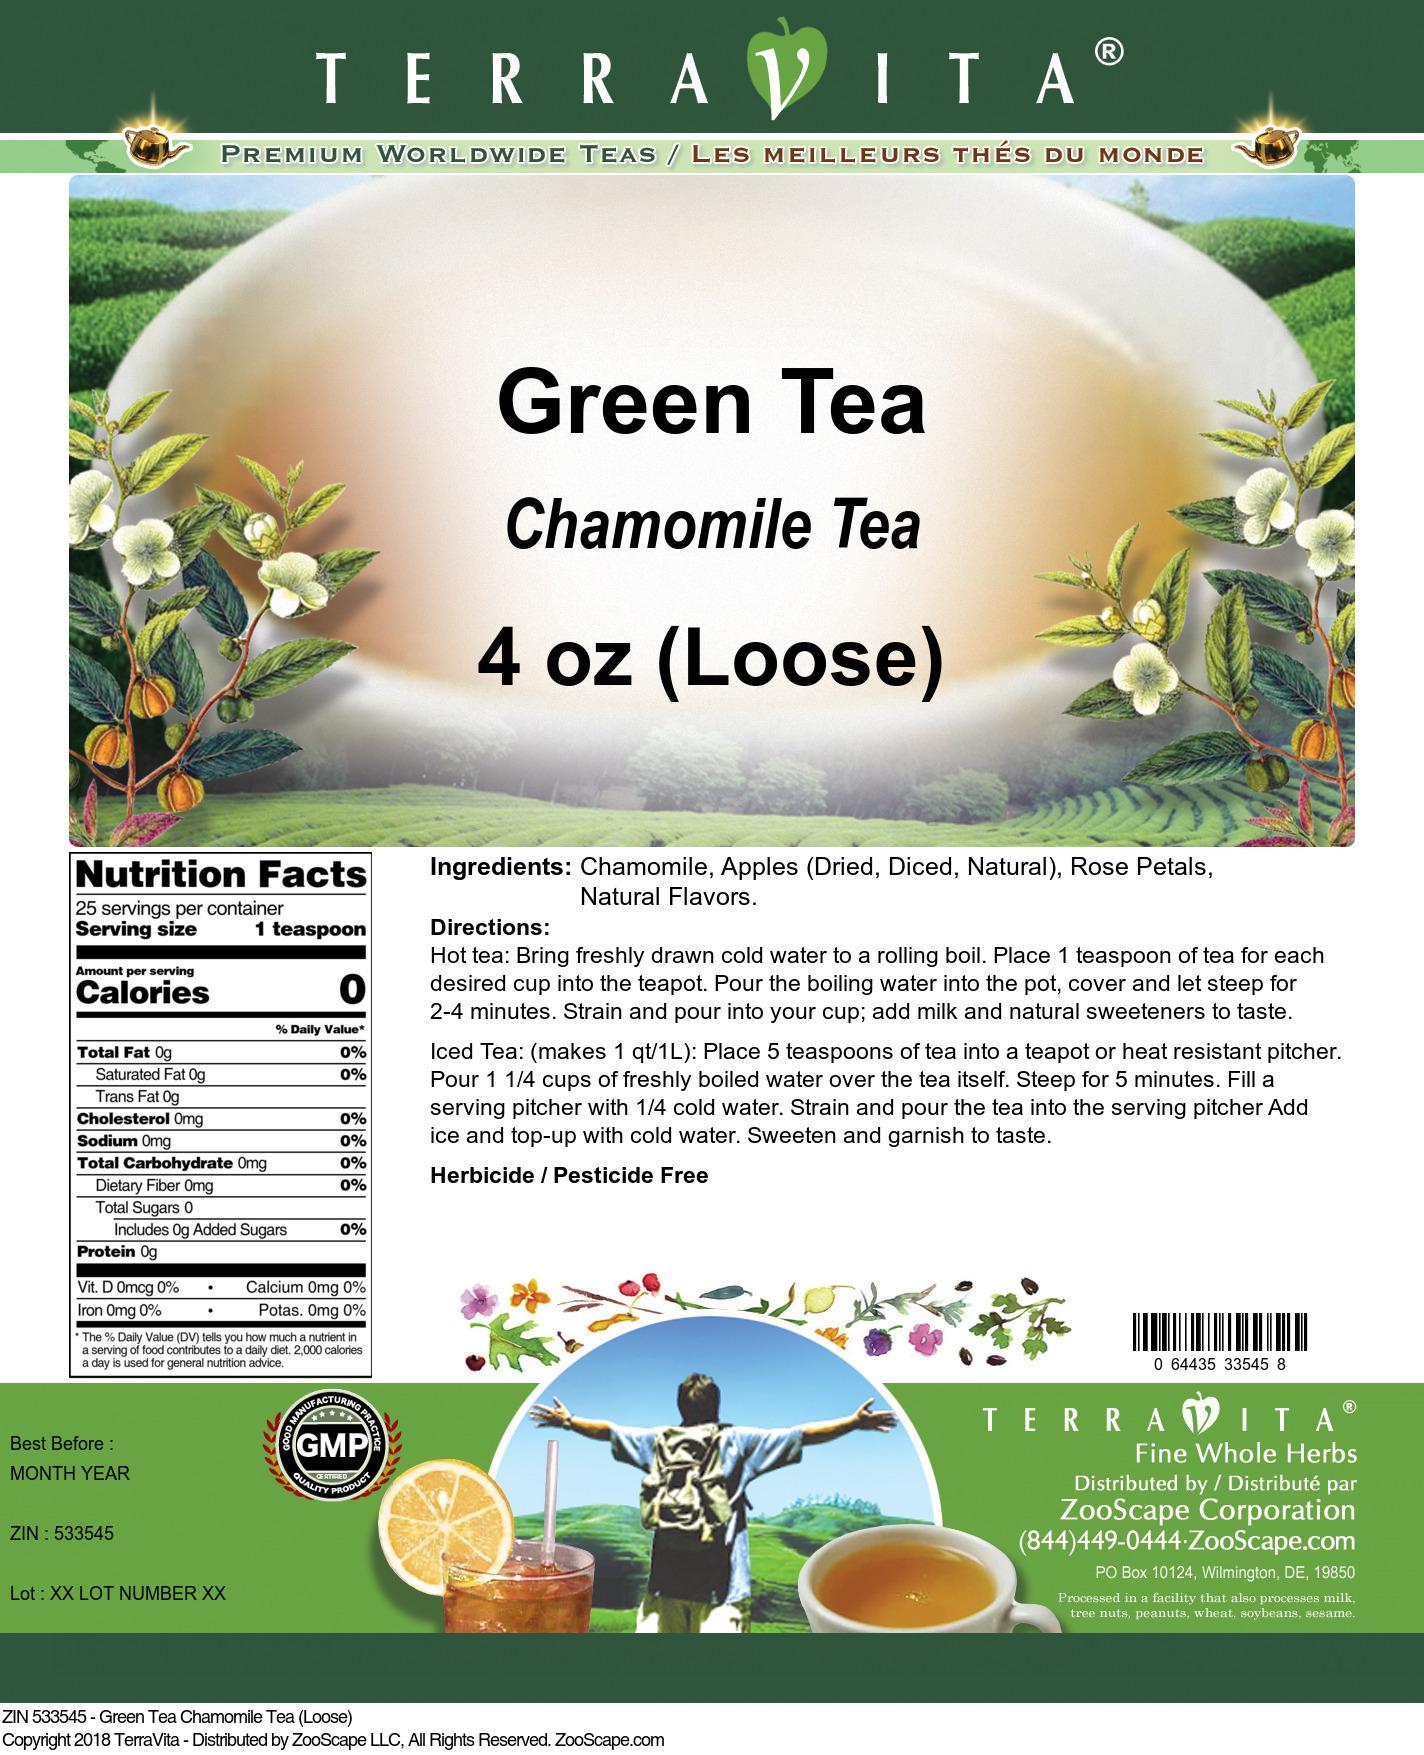 Green Tea Chamomile Tea